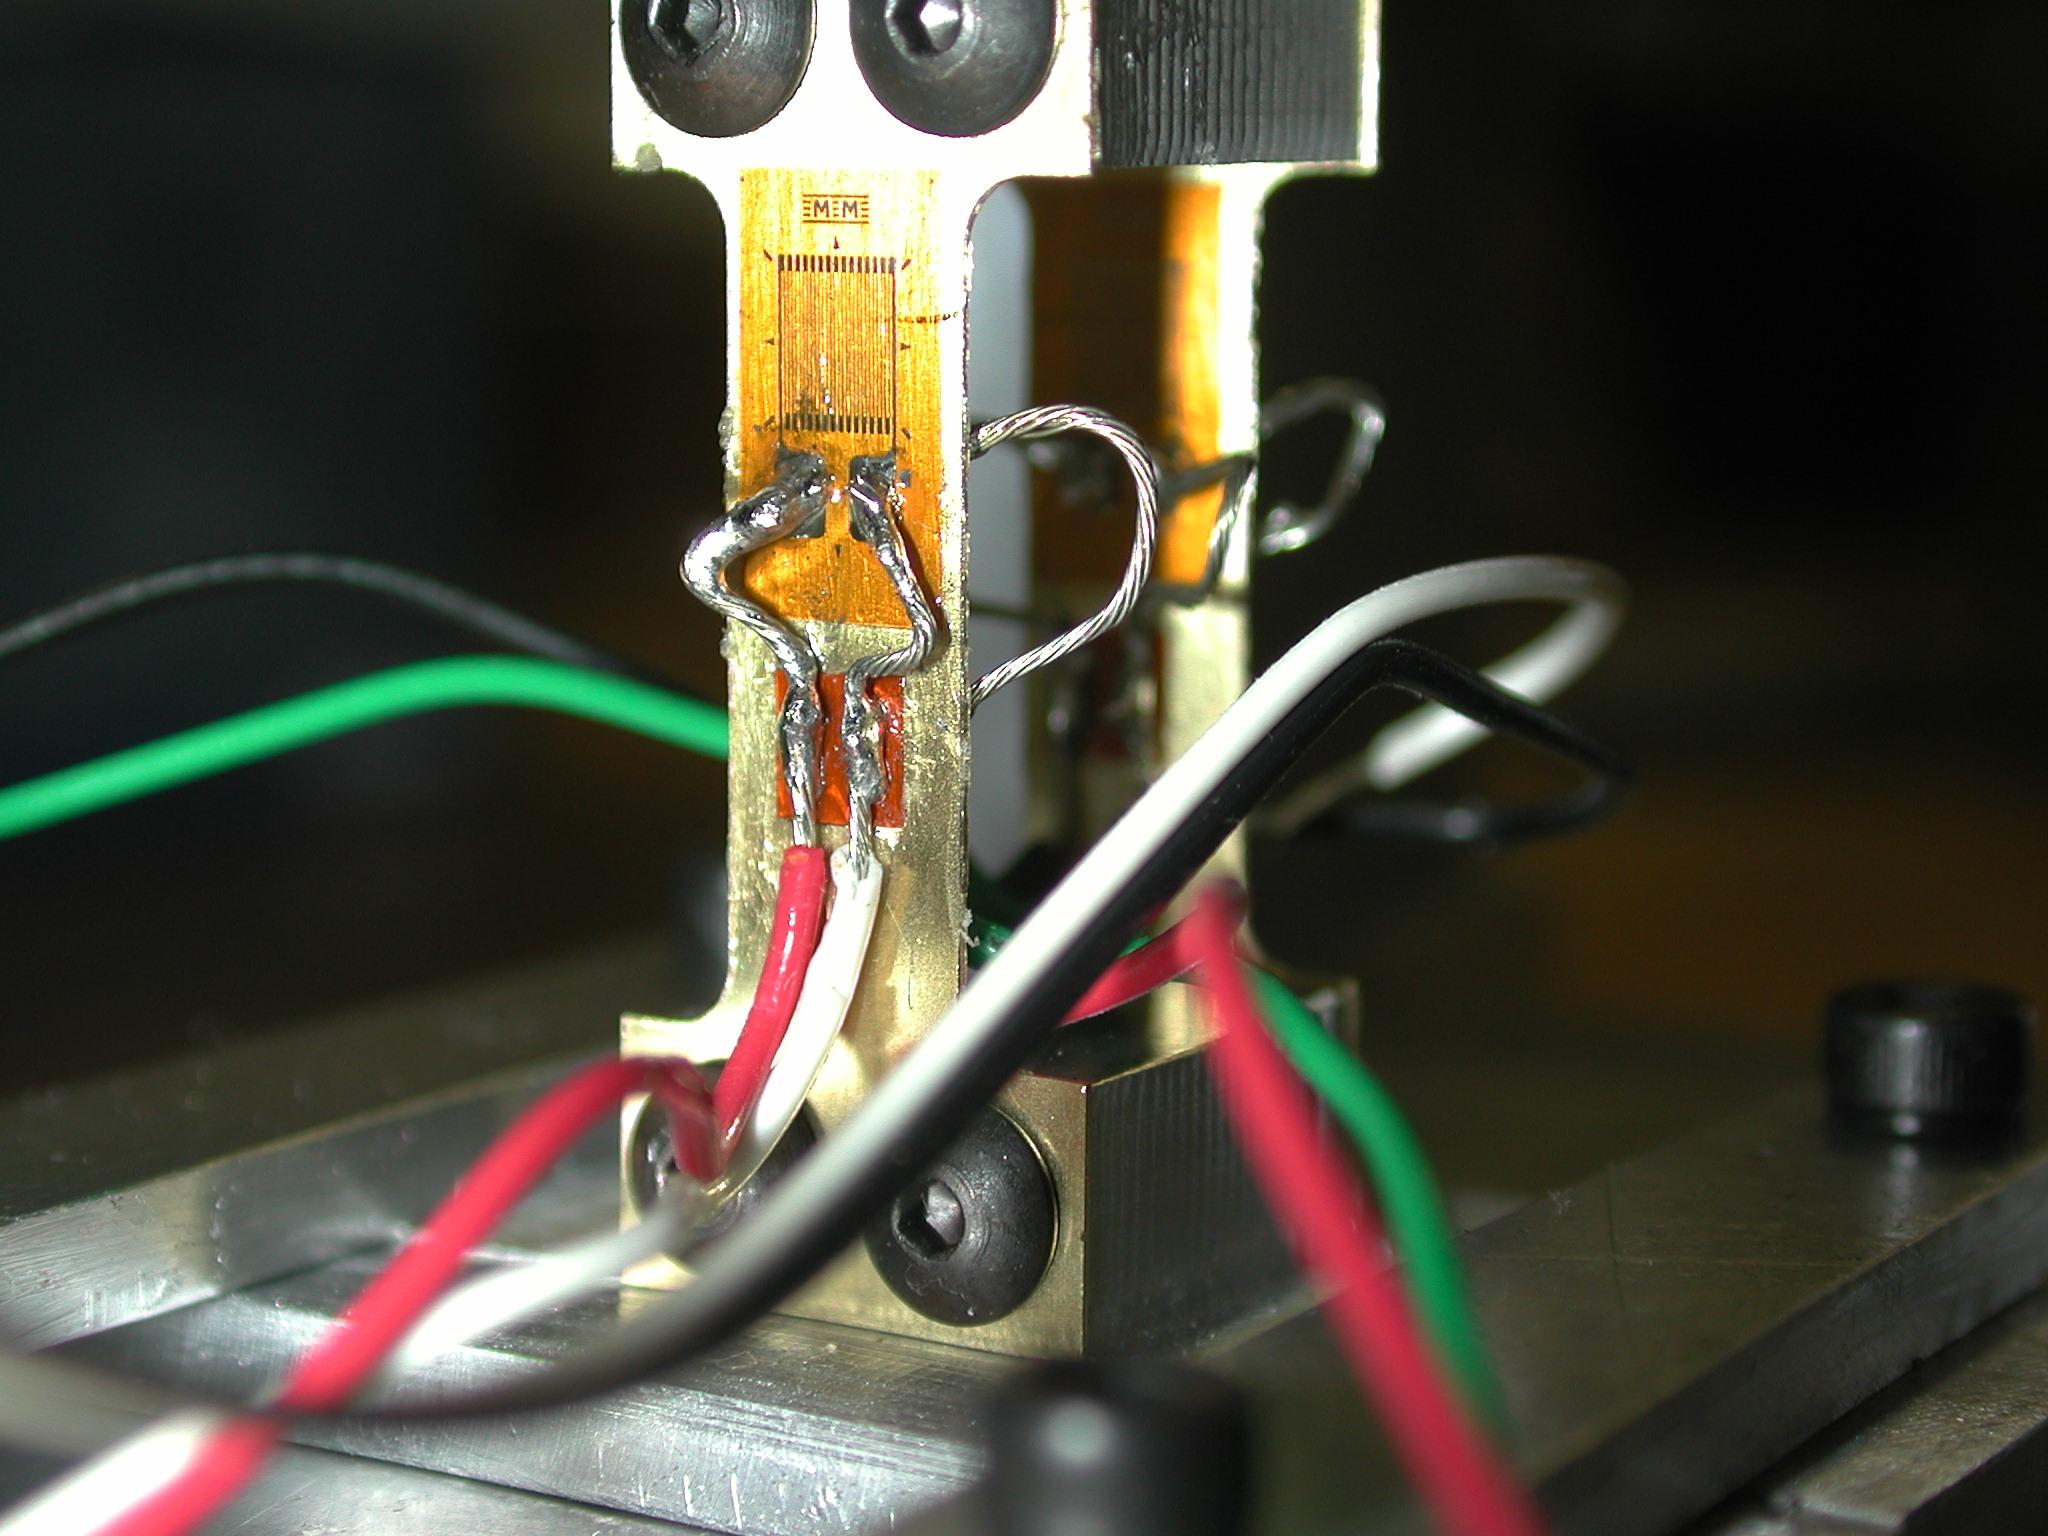 Shear Stress Sensors Strain Gauge Wiring Flexure Beams With Gauges